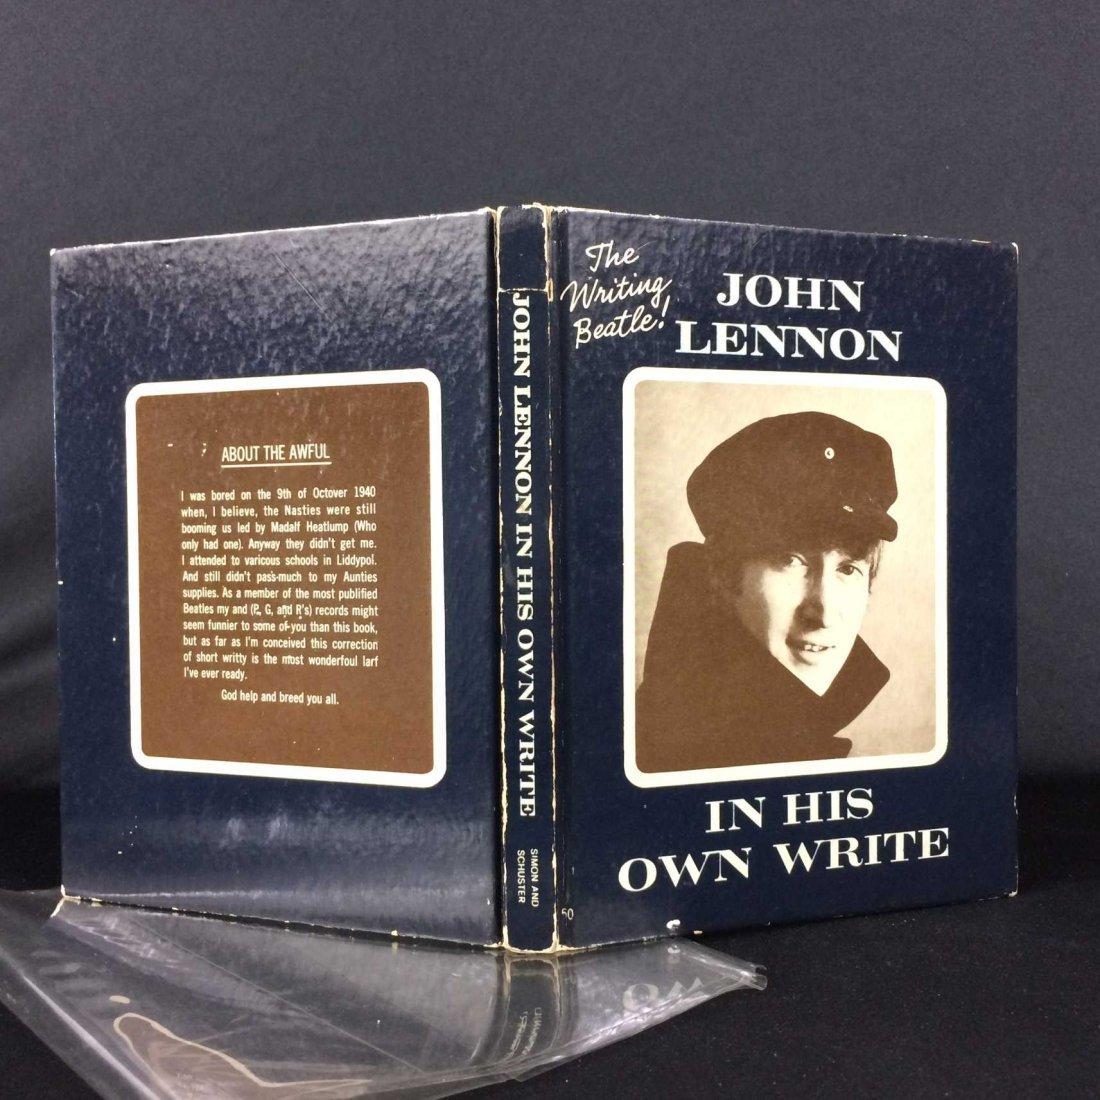 John Lennon Book Signed & Inscribed w/ Original Sketch!